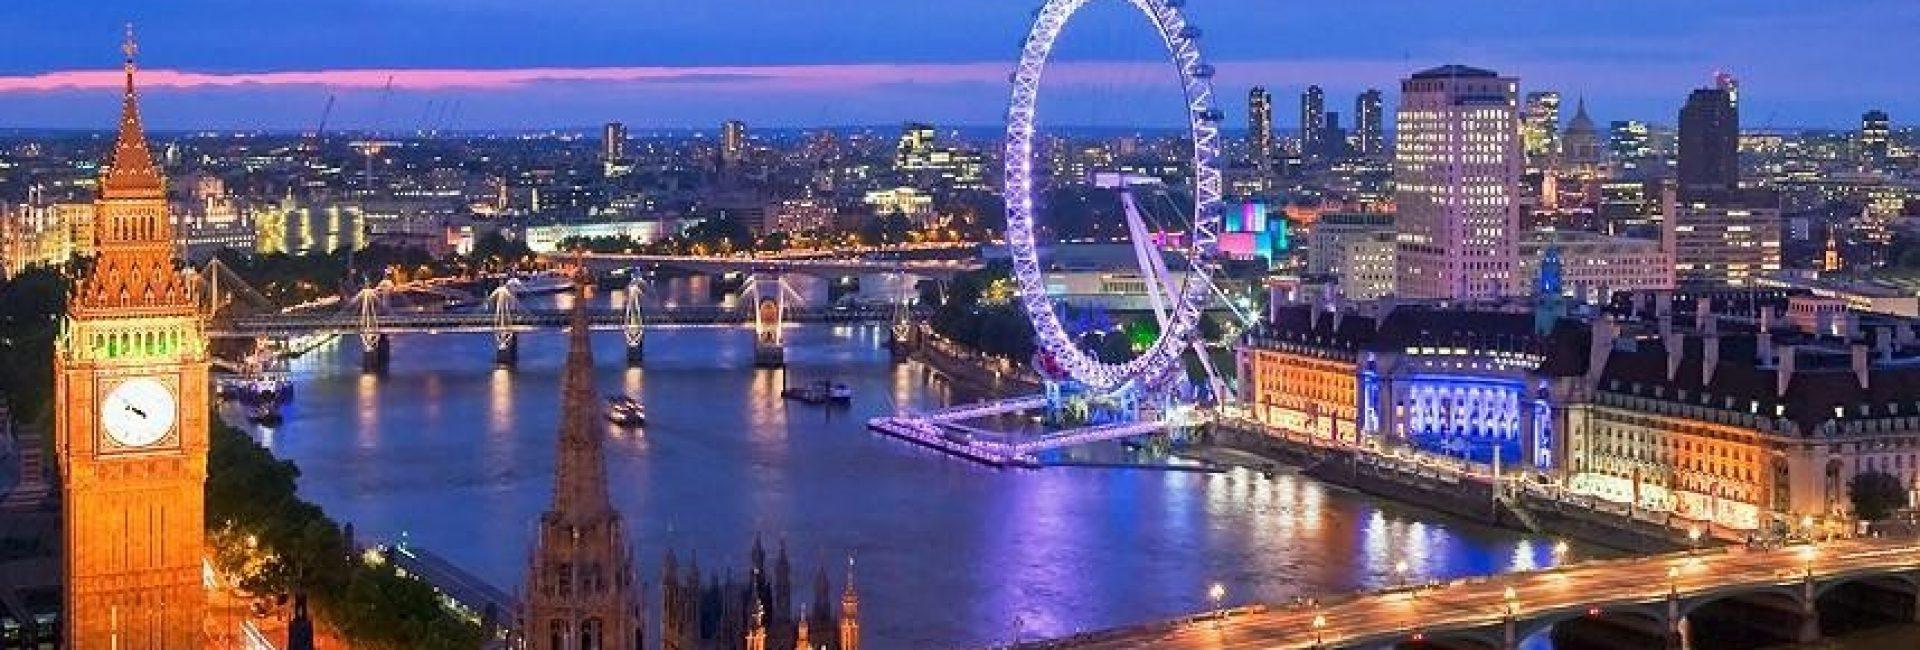 Tečaj engleskoj jezika - South Bank University London